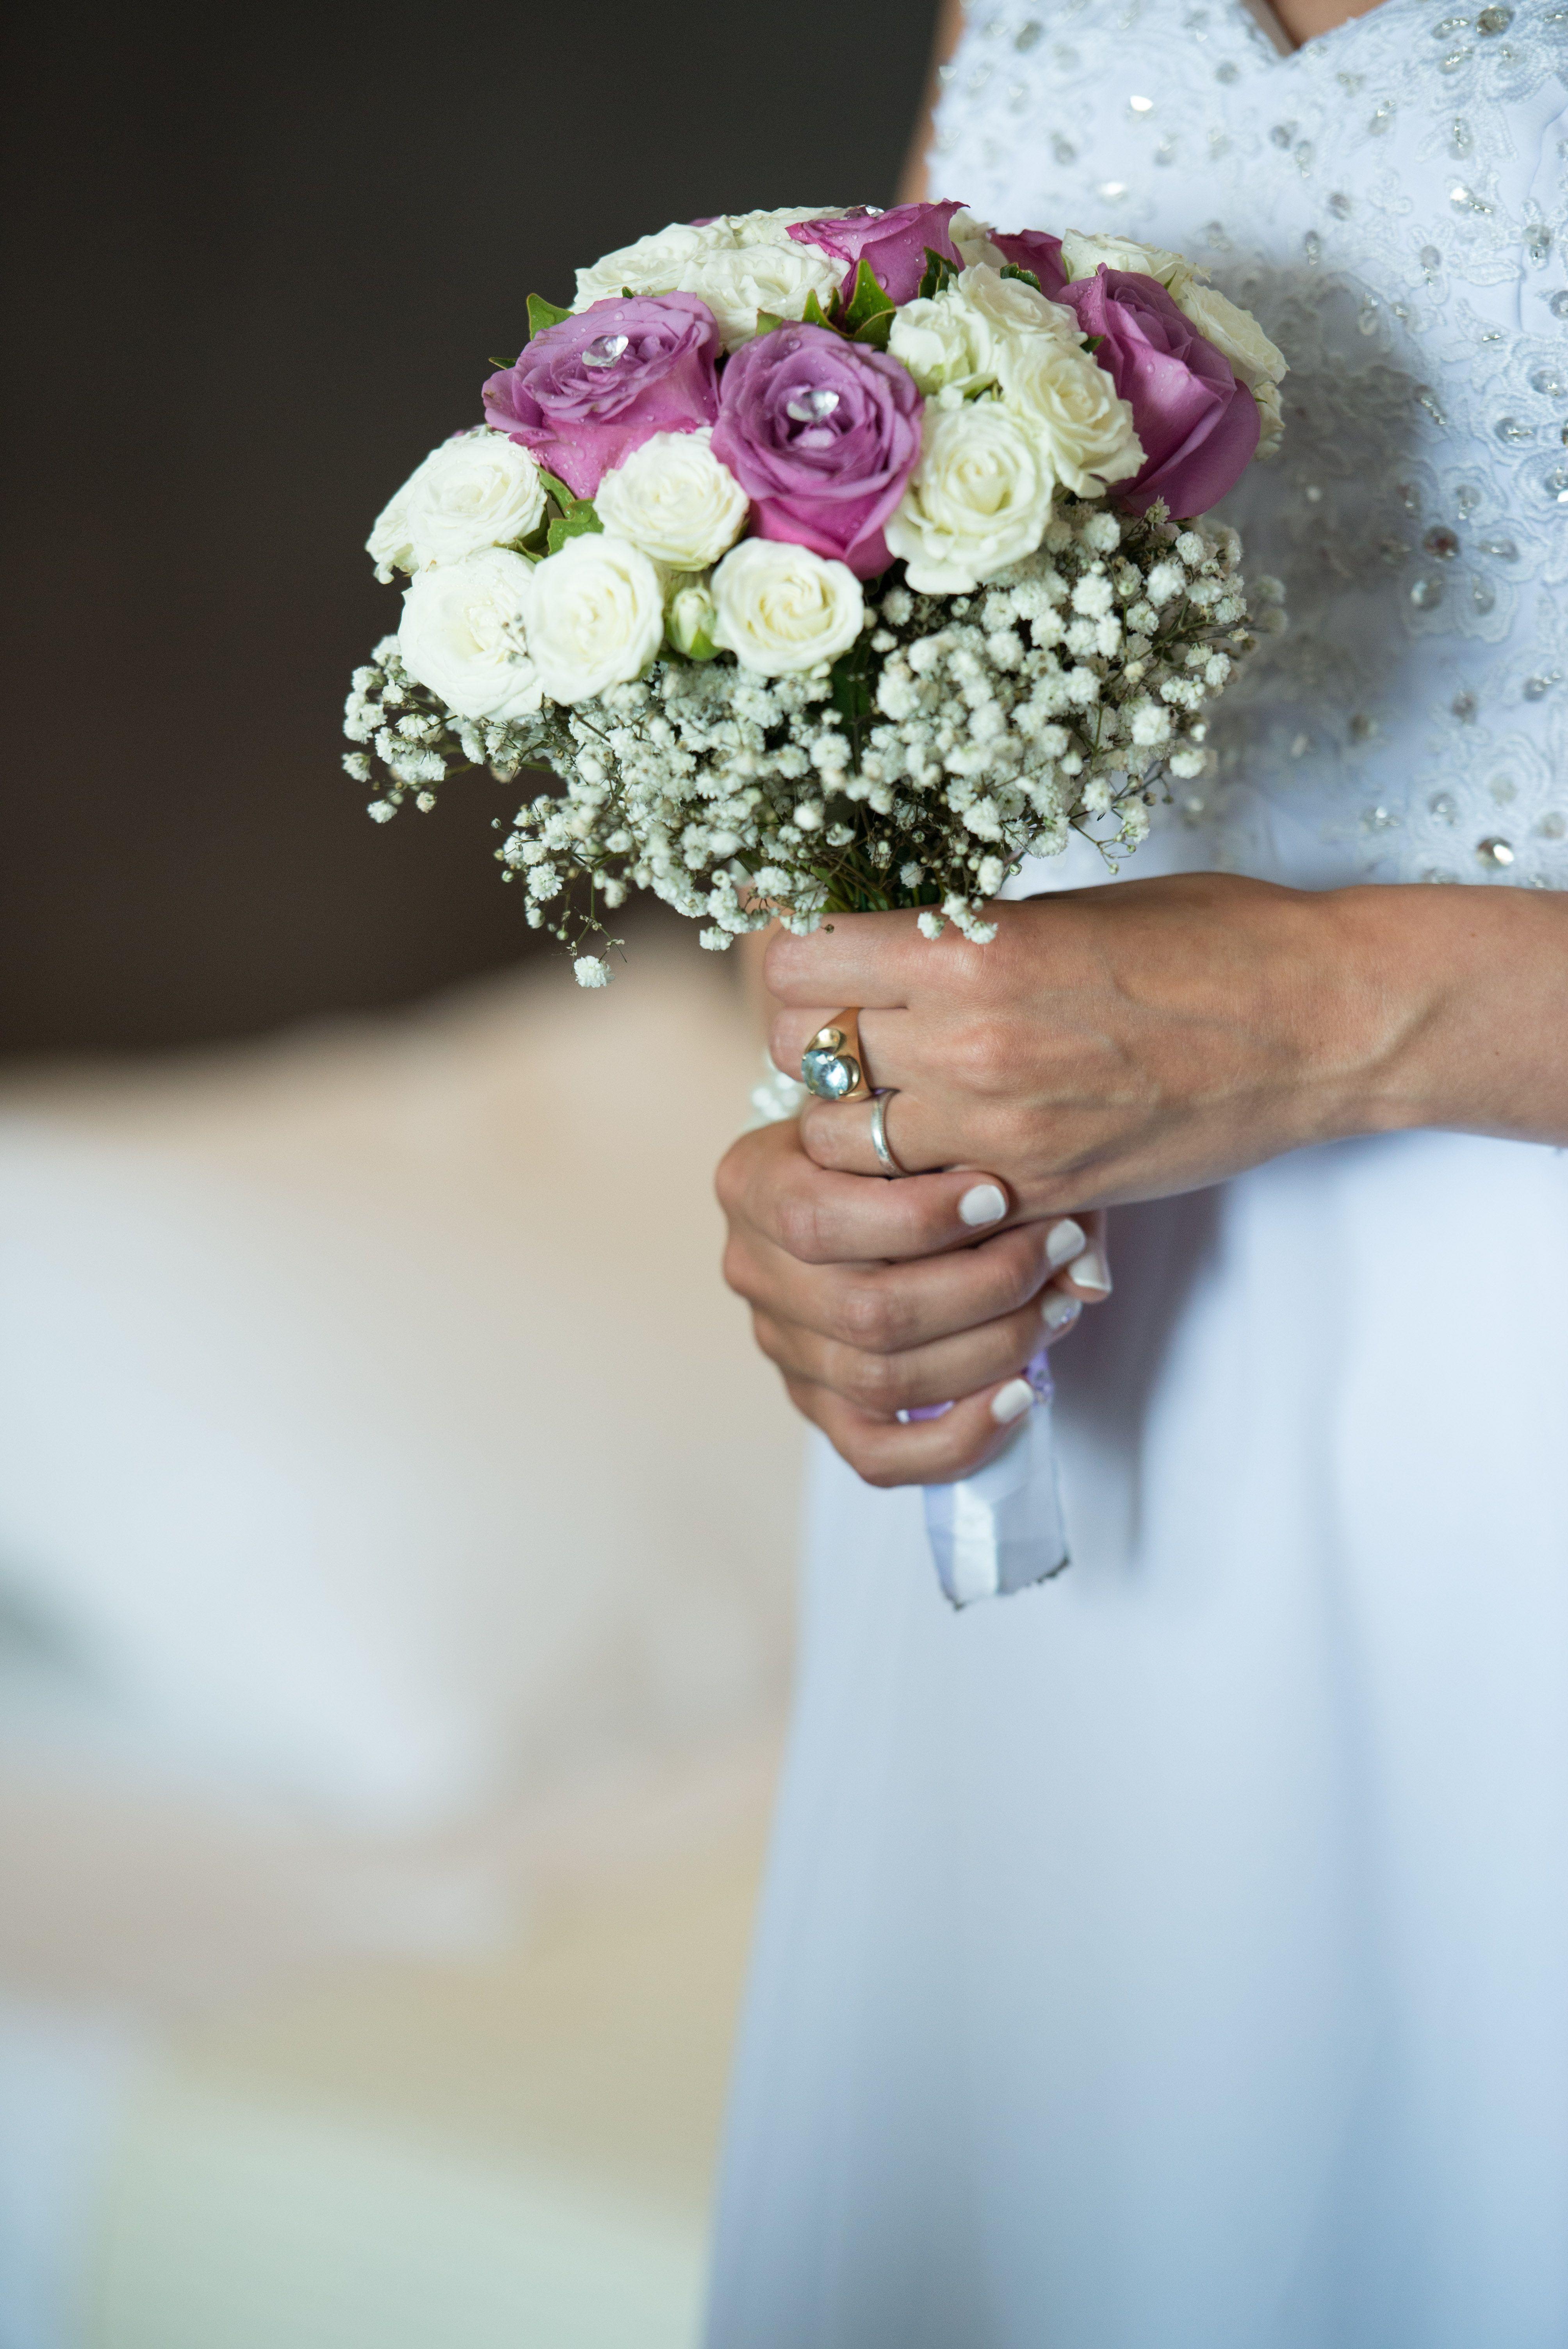 Bridal bouquets. Destination weddings, experienced wedding planners. Odyssey weddings: we plan your dream wedding!